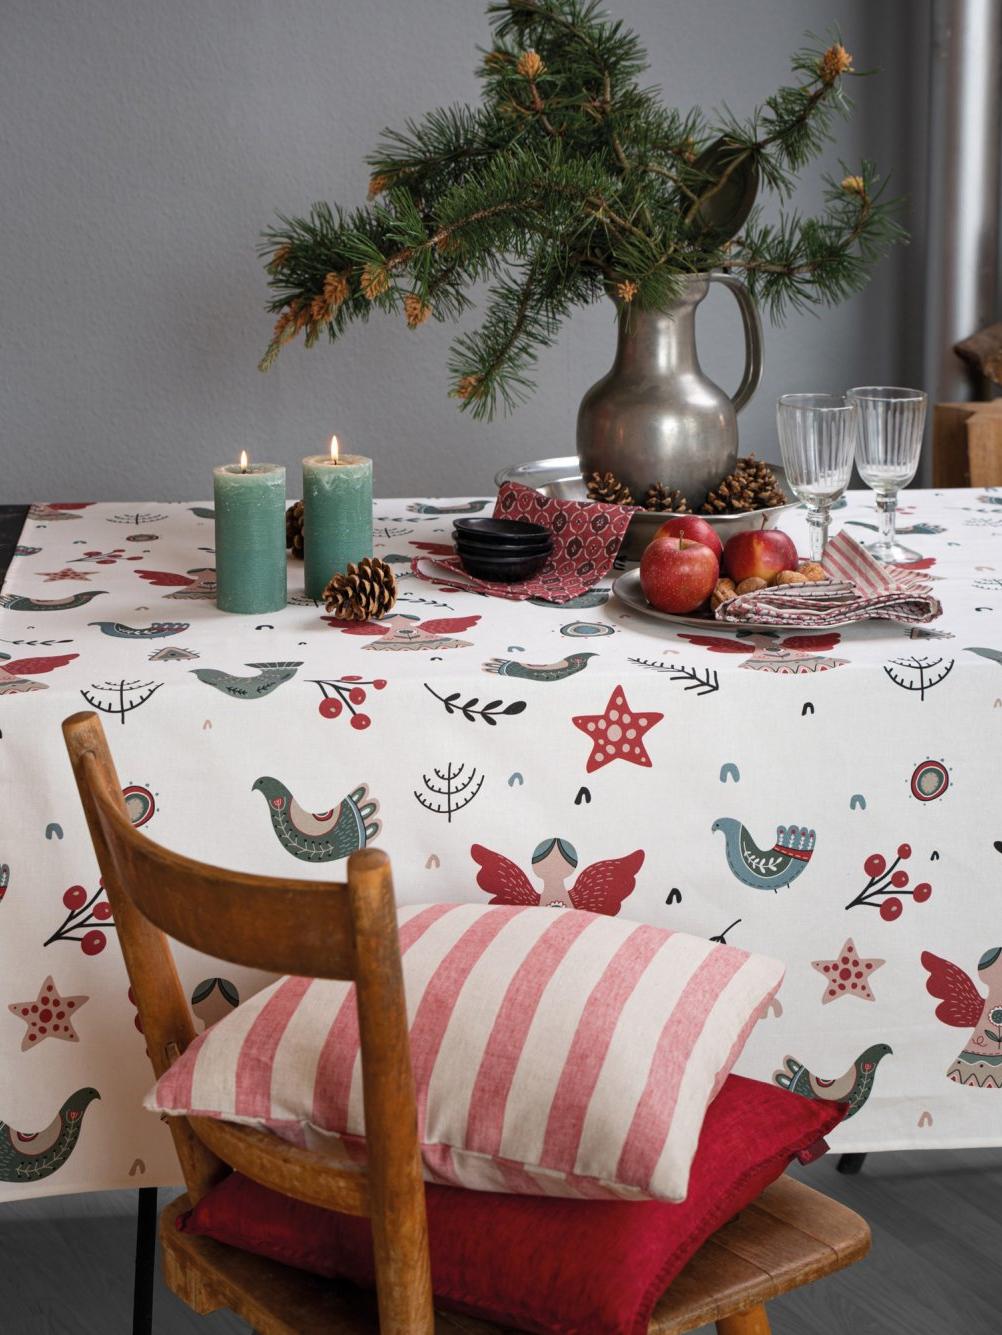 《Pichler》2020秋冬圣诞节主题家居用品系列Lookbook